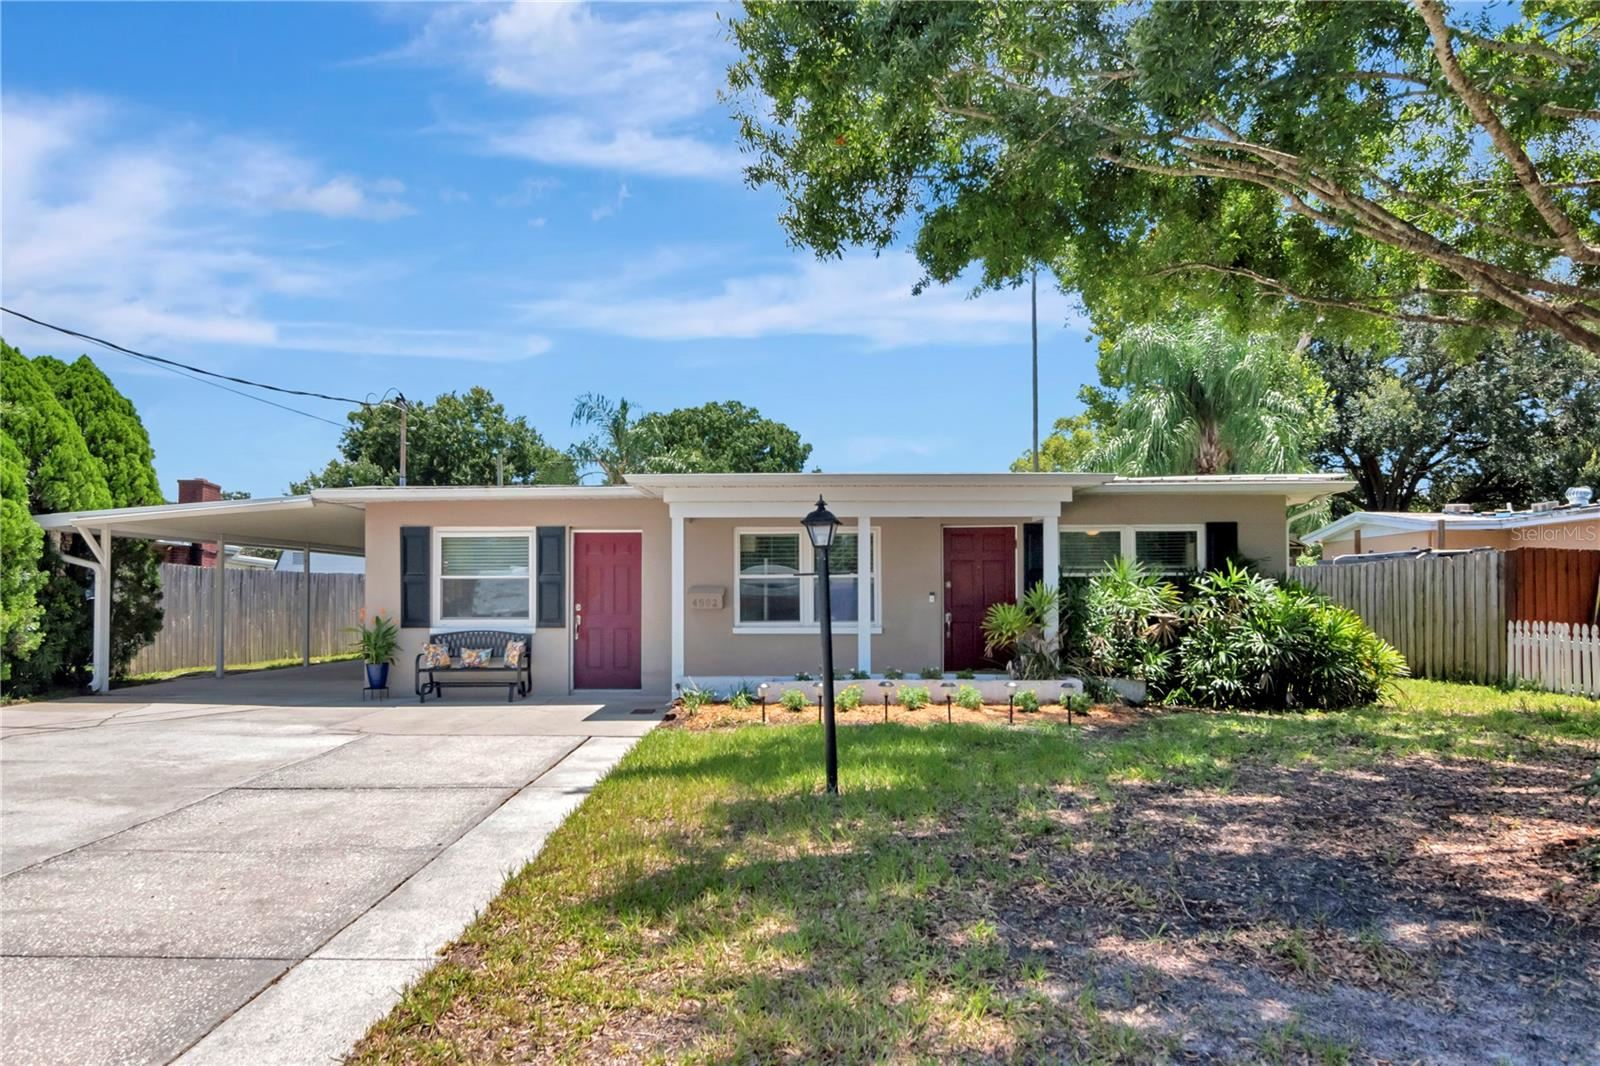 4502 S HALE AVENUE, Tampa, FL 33611 - #: T3319416